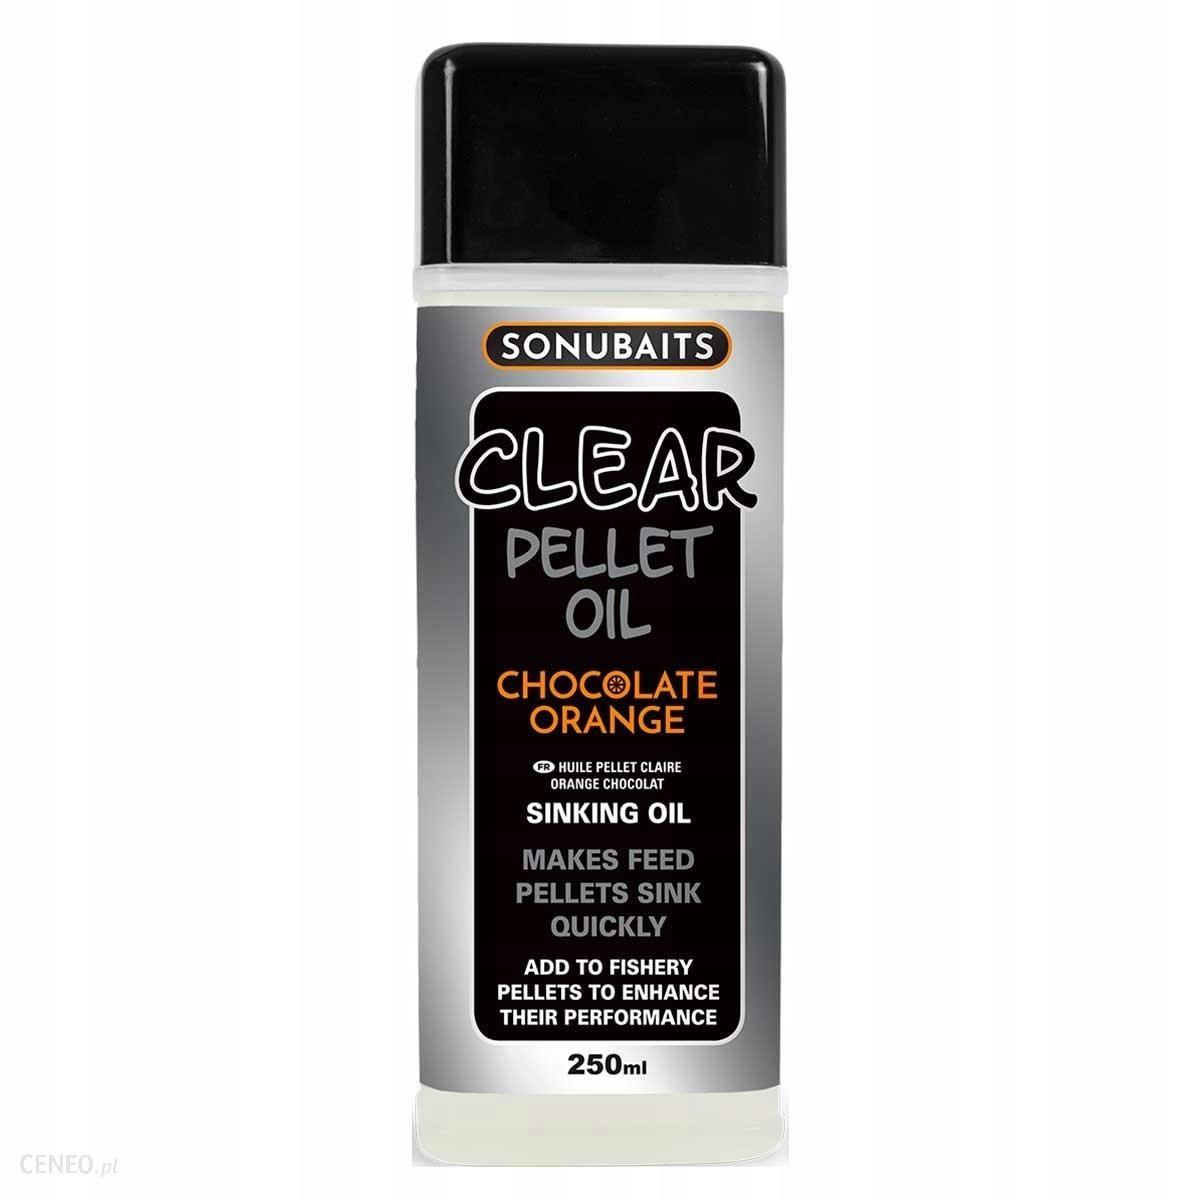 Sonubaits Clear Pellet Oil Chocolate Orange 250ml